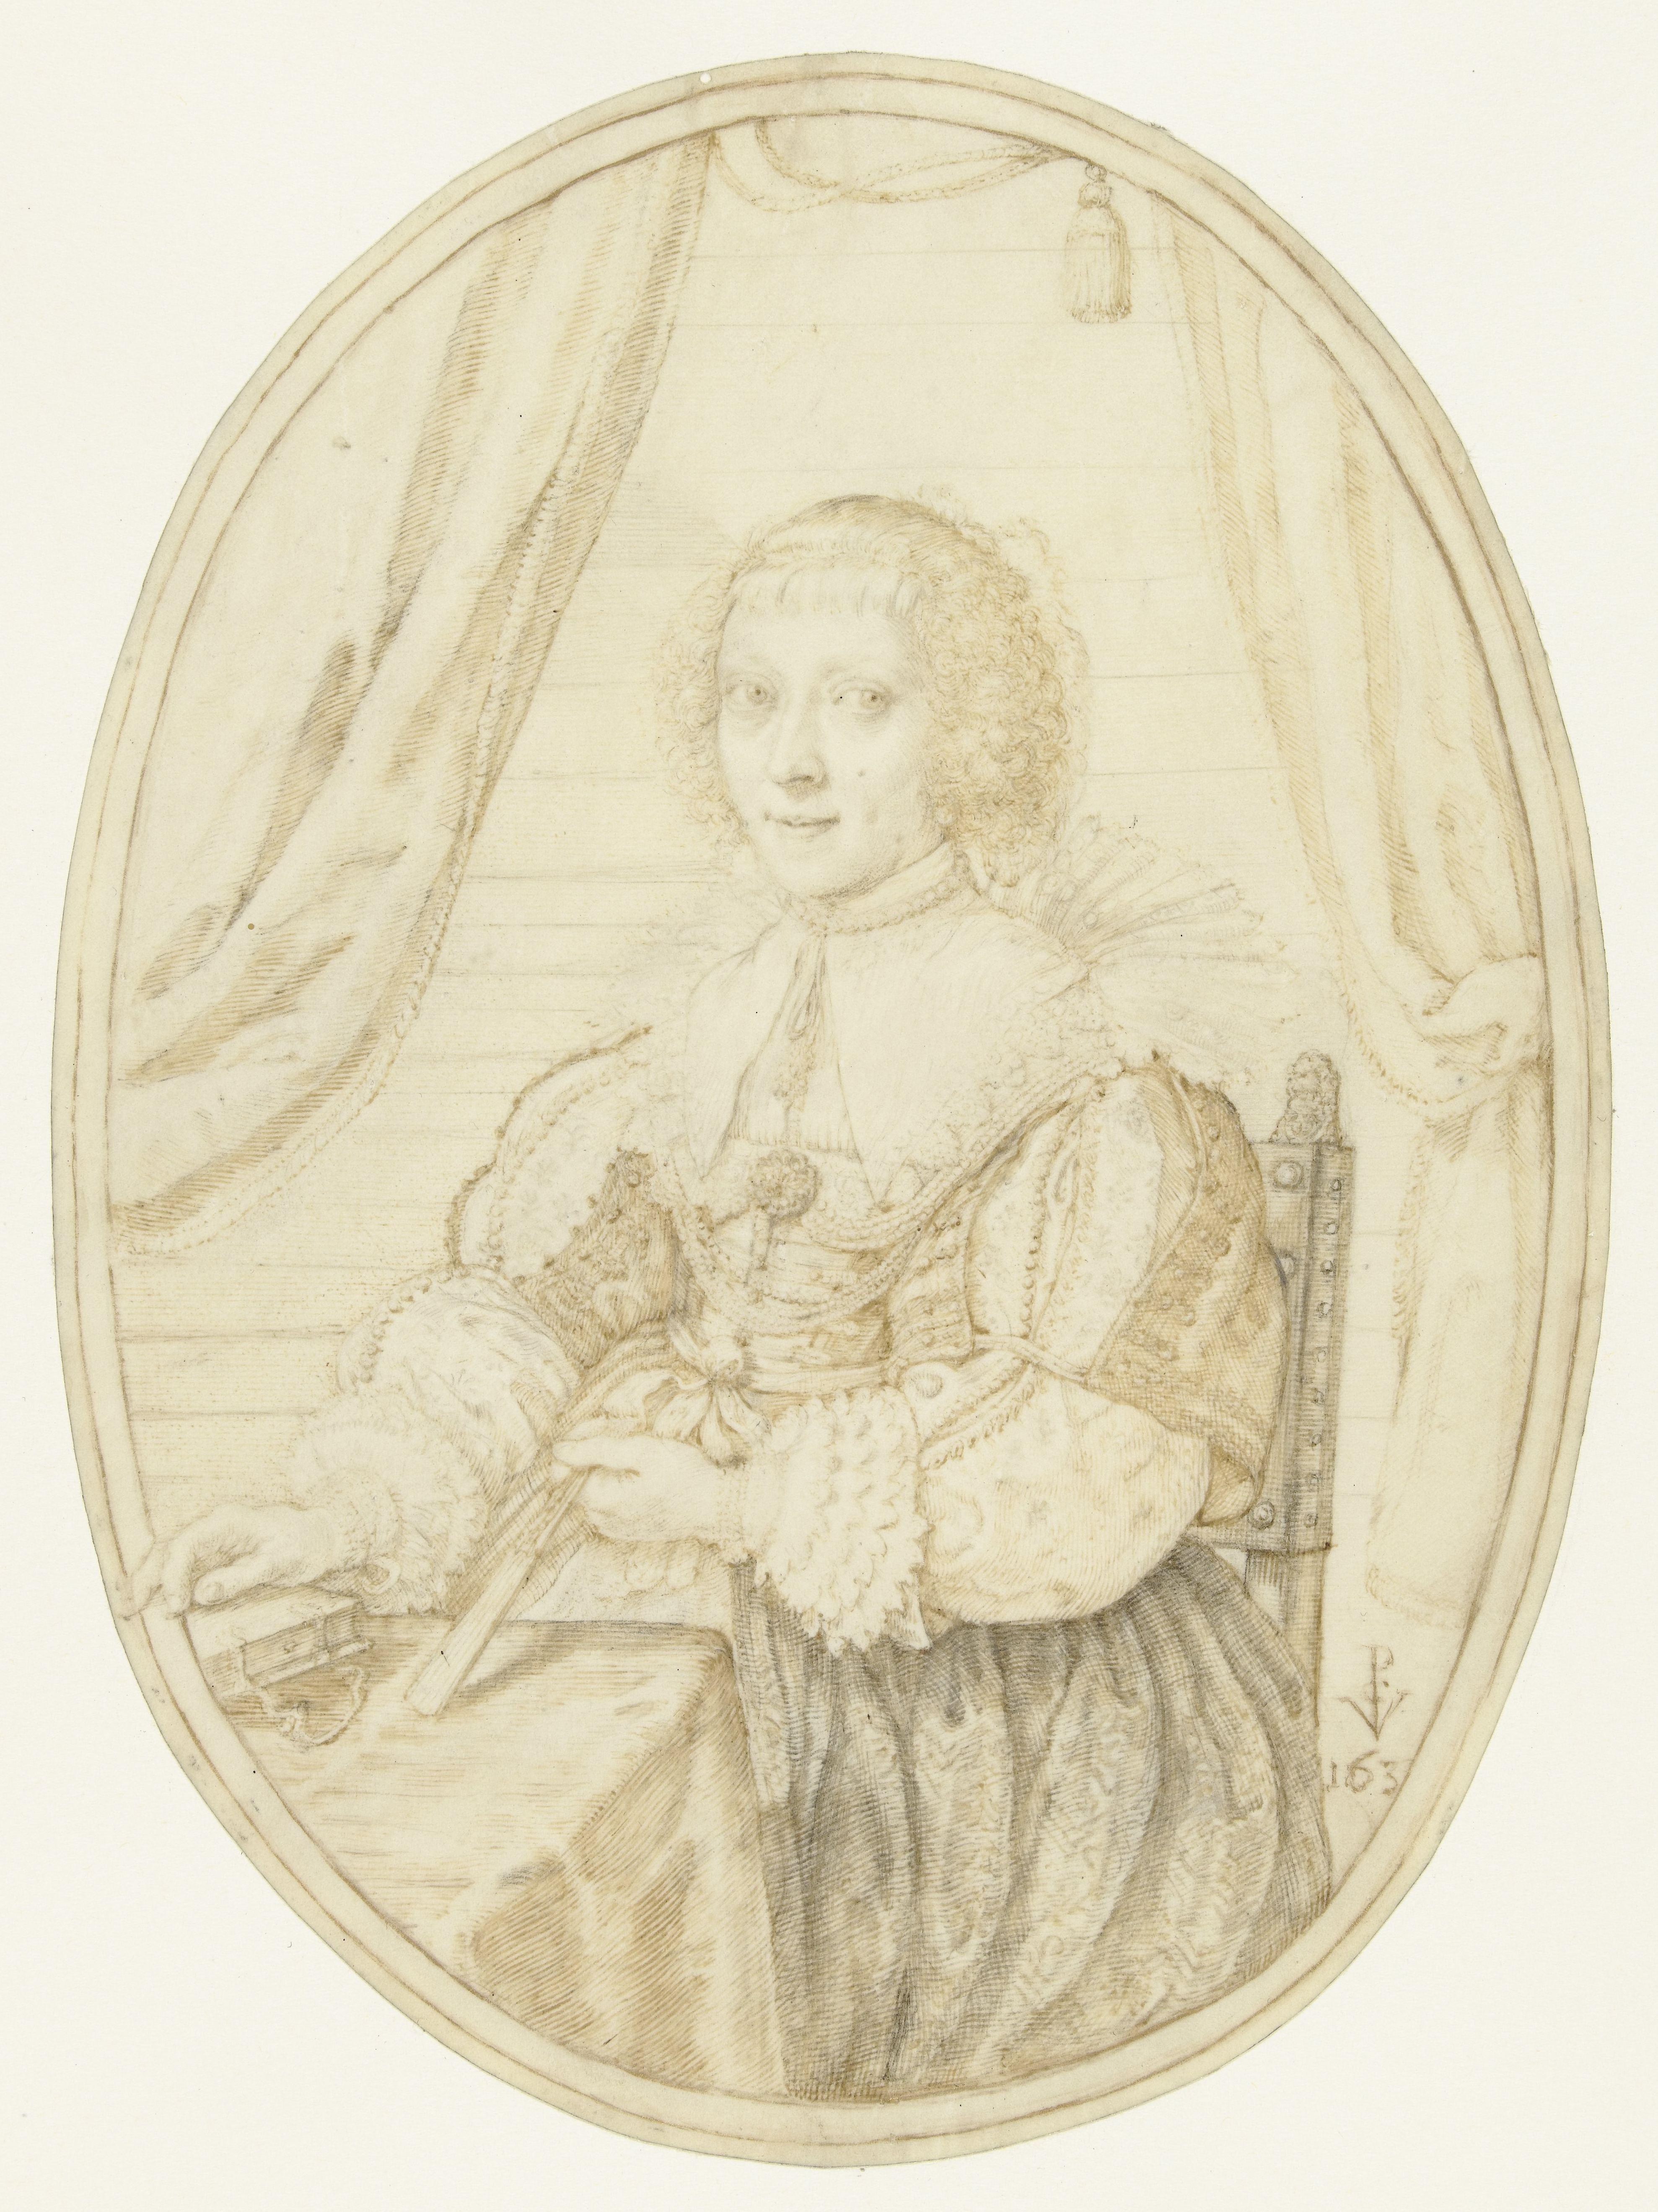 Crispin II de Passe, Portrait d' Anna Maria van Schurman, Rijkmuseum